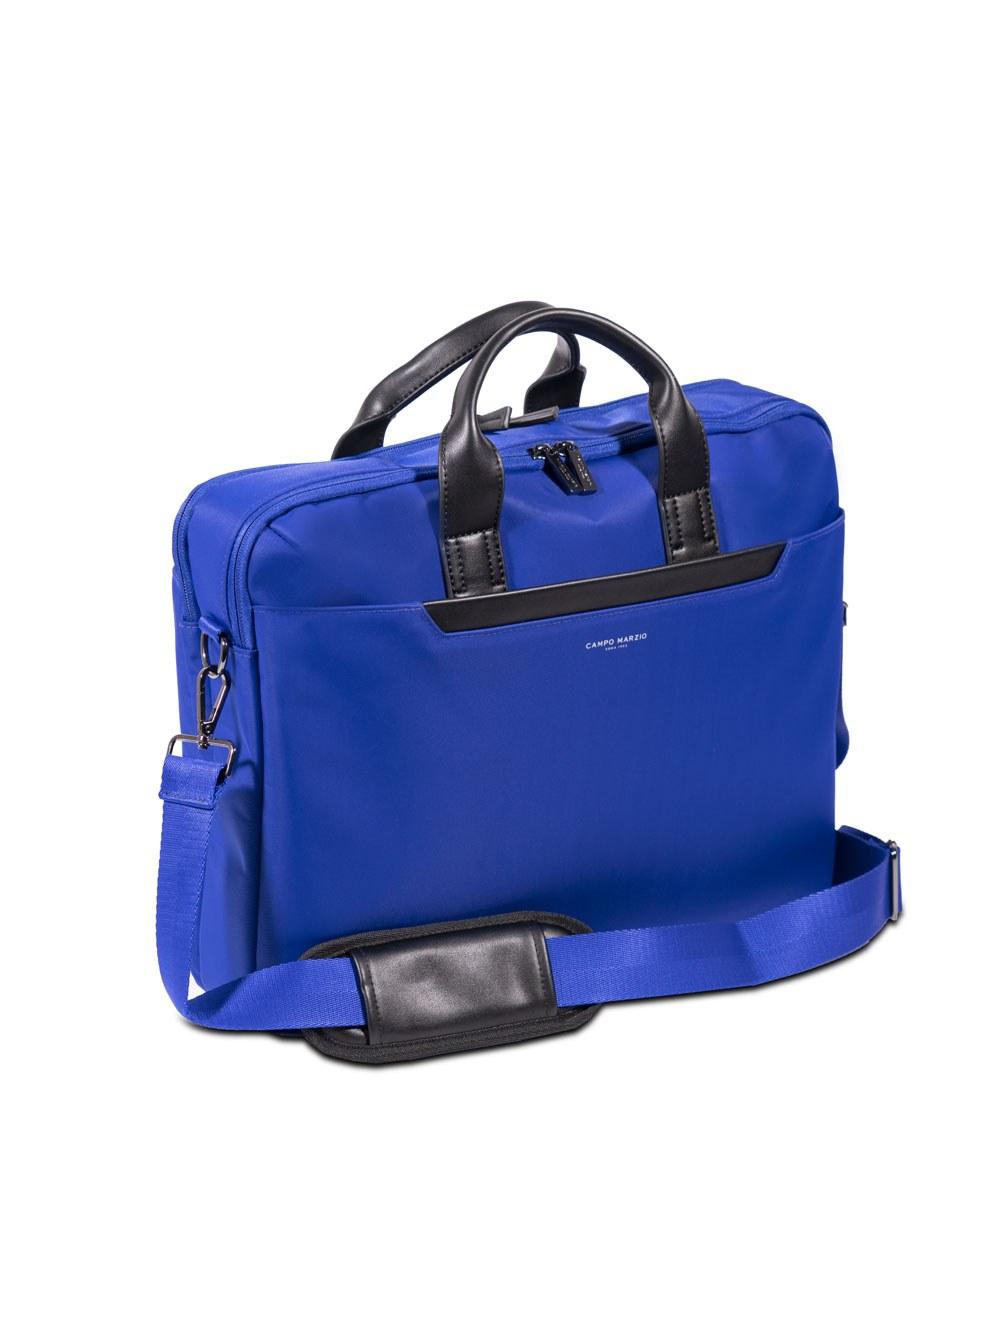 "Laptop Holder 15.6"" - Blueberry"